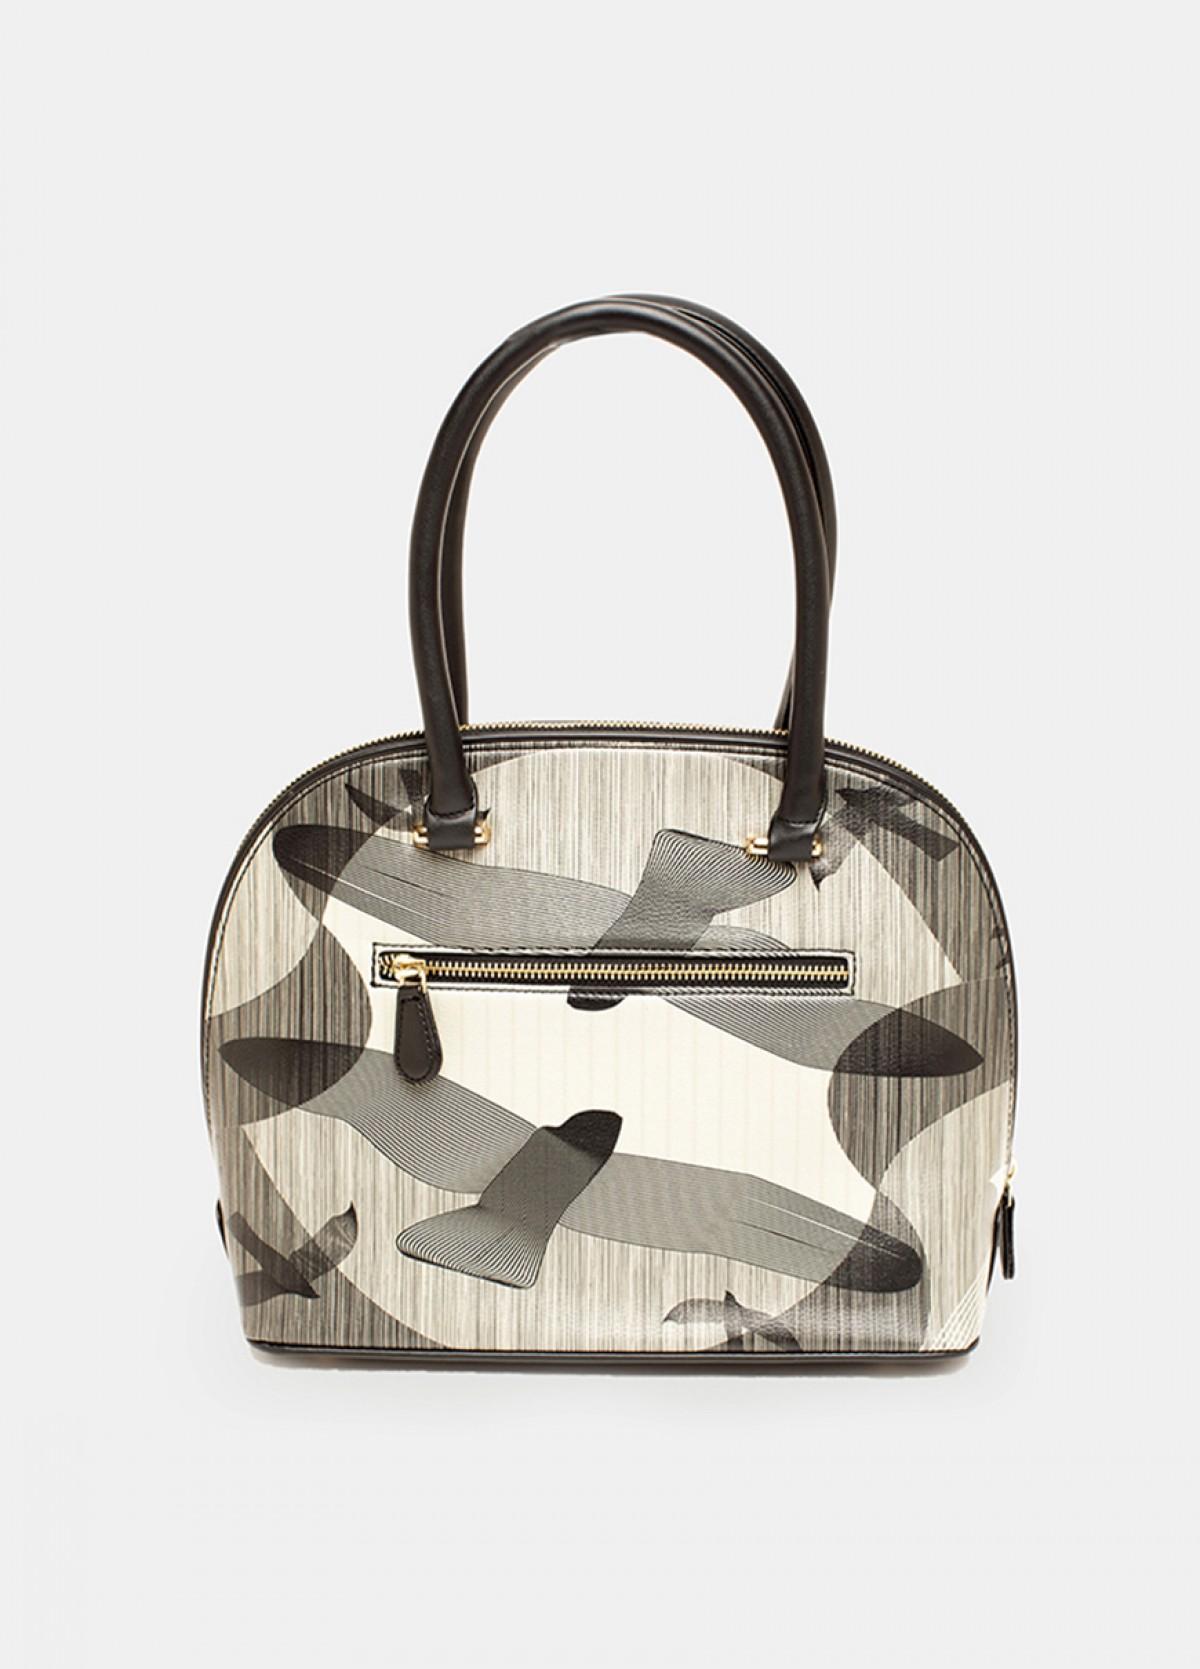 The Dusk Handbag